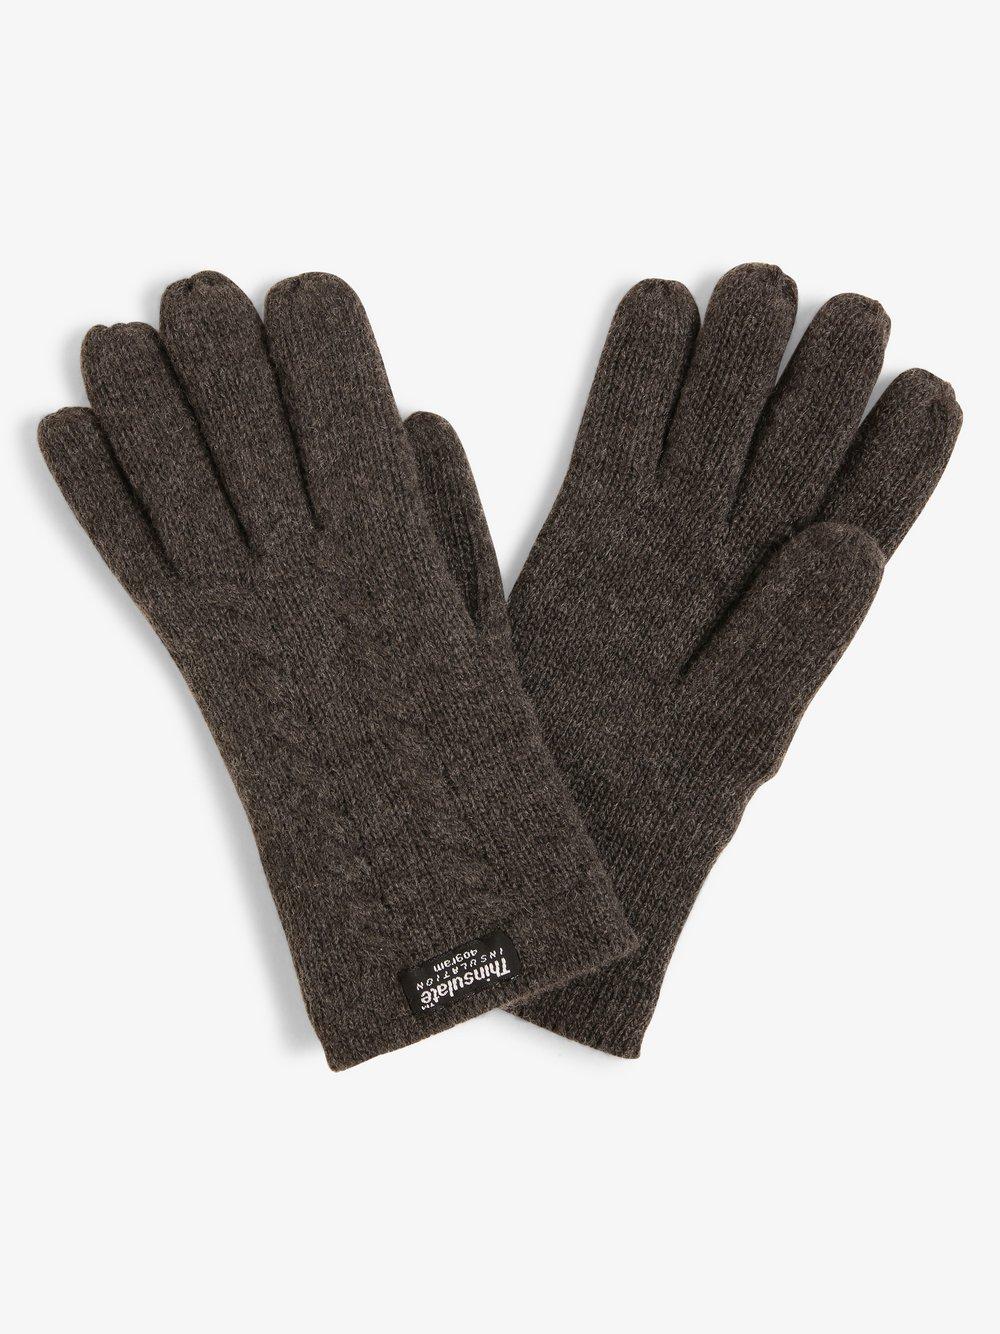 Melkonian – Rękawiczki damskie, szary Van Graaf 416040-0002